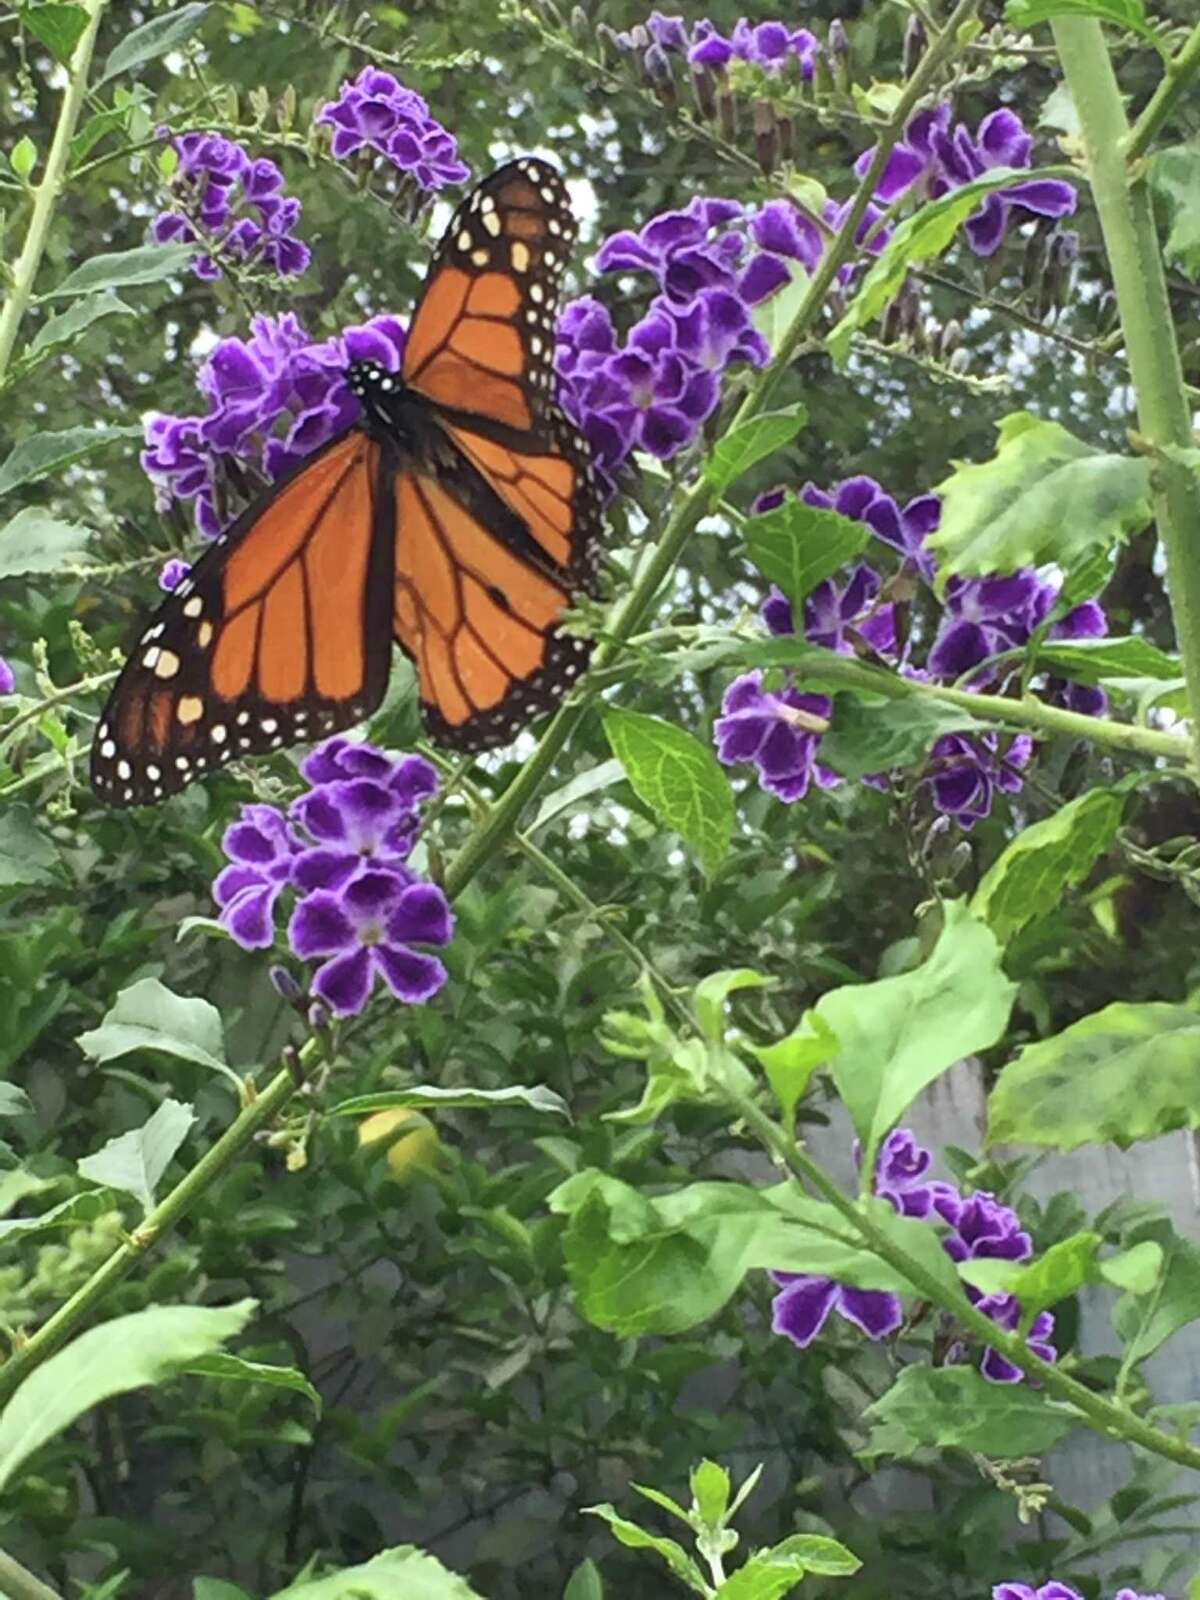 Purple duranta is a favorite of butterflies.